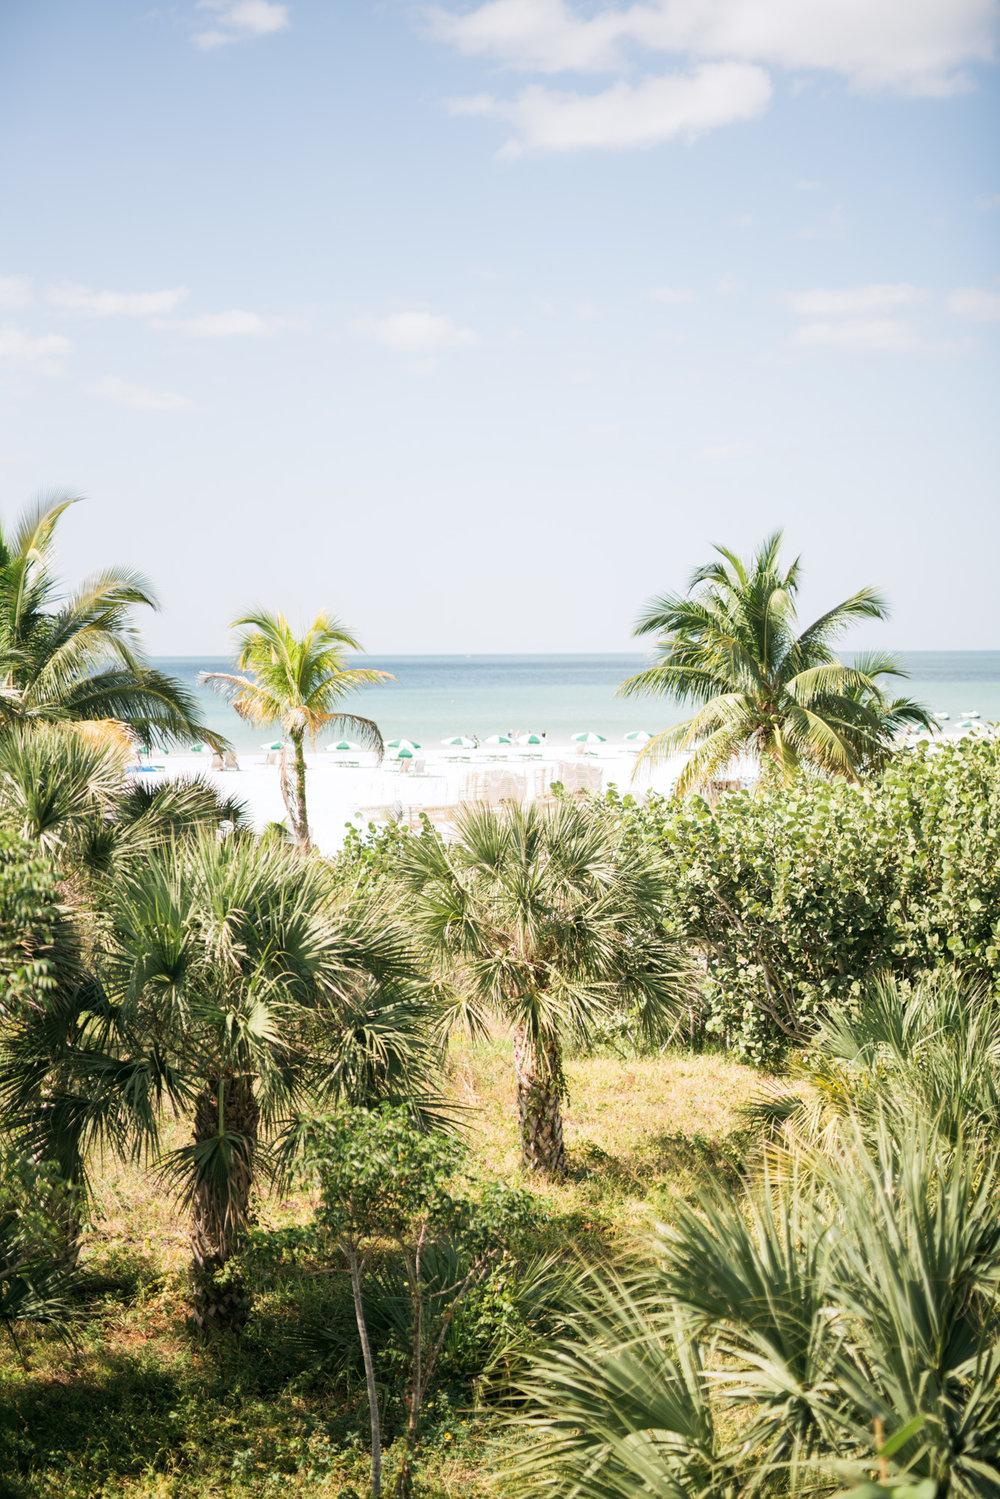 marco-beach-ocean-resort-naples-florida-wedding-photographer-hunter-ryan-photo-04478.jpg